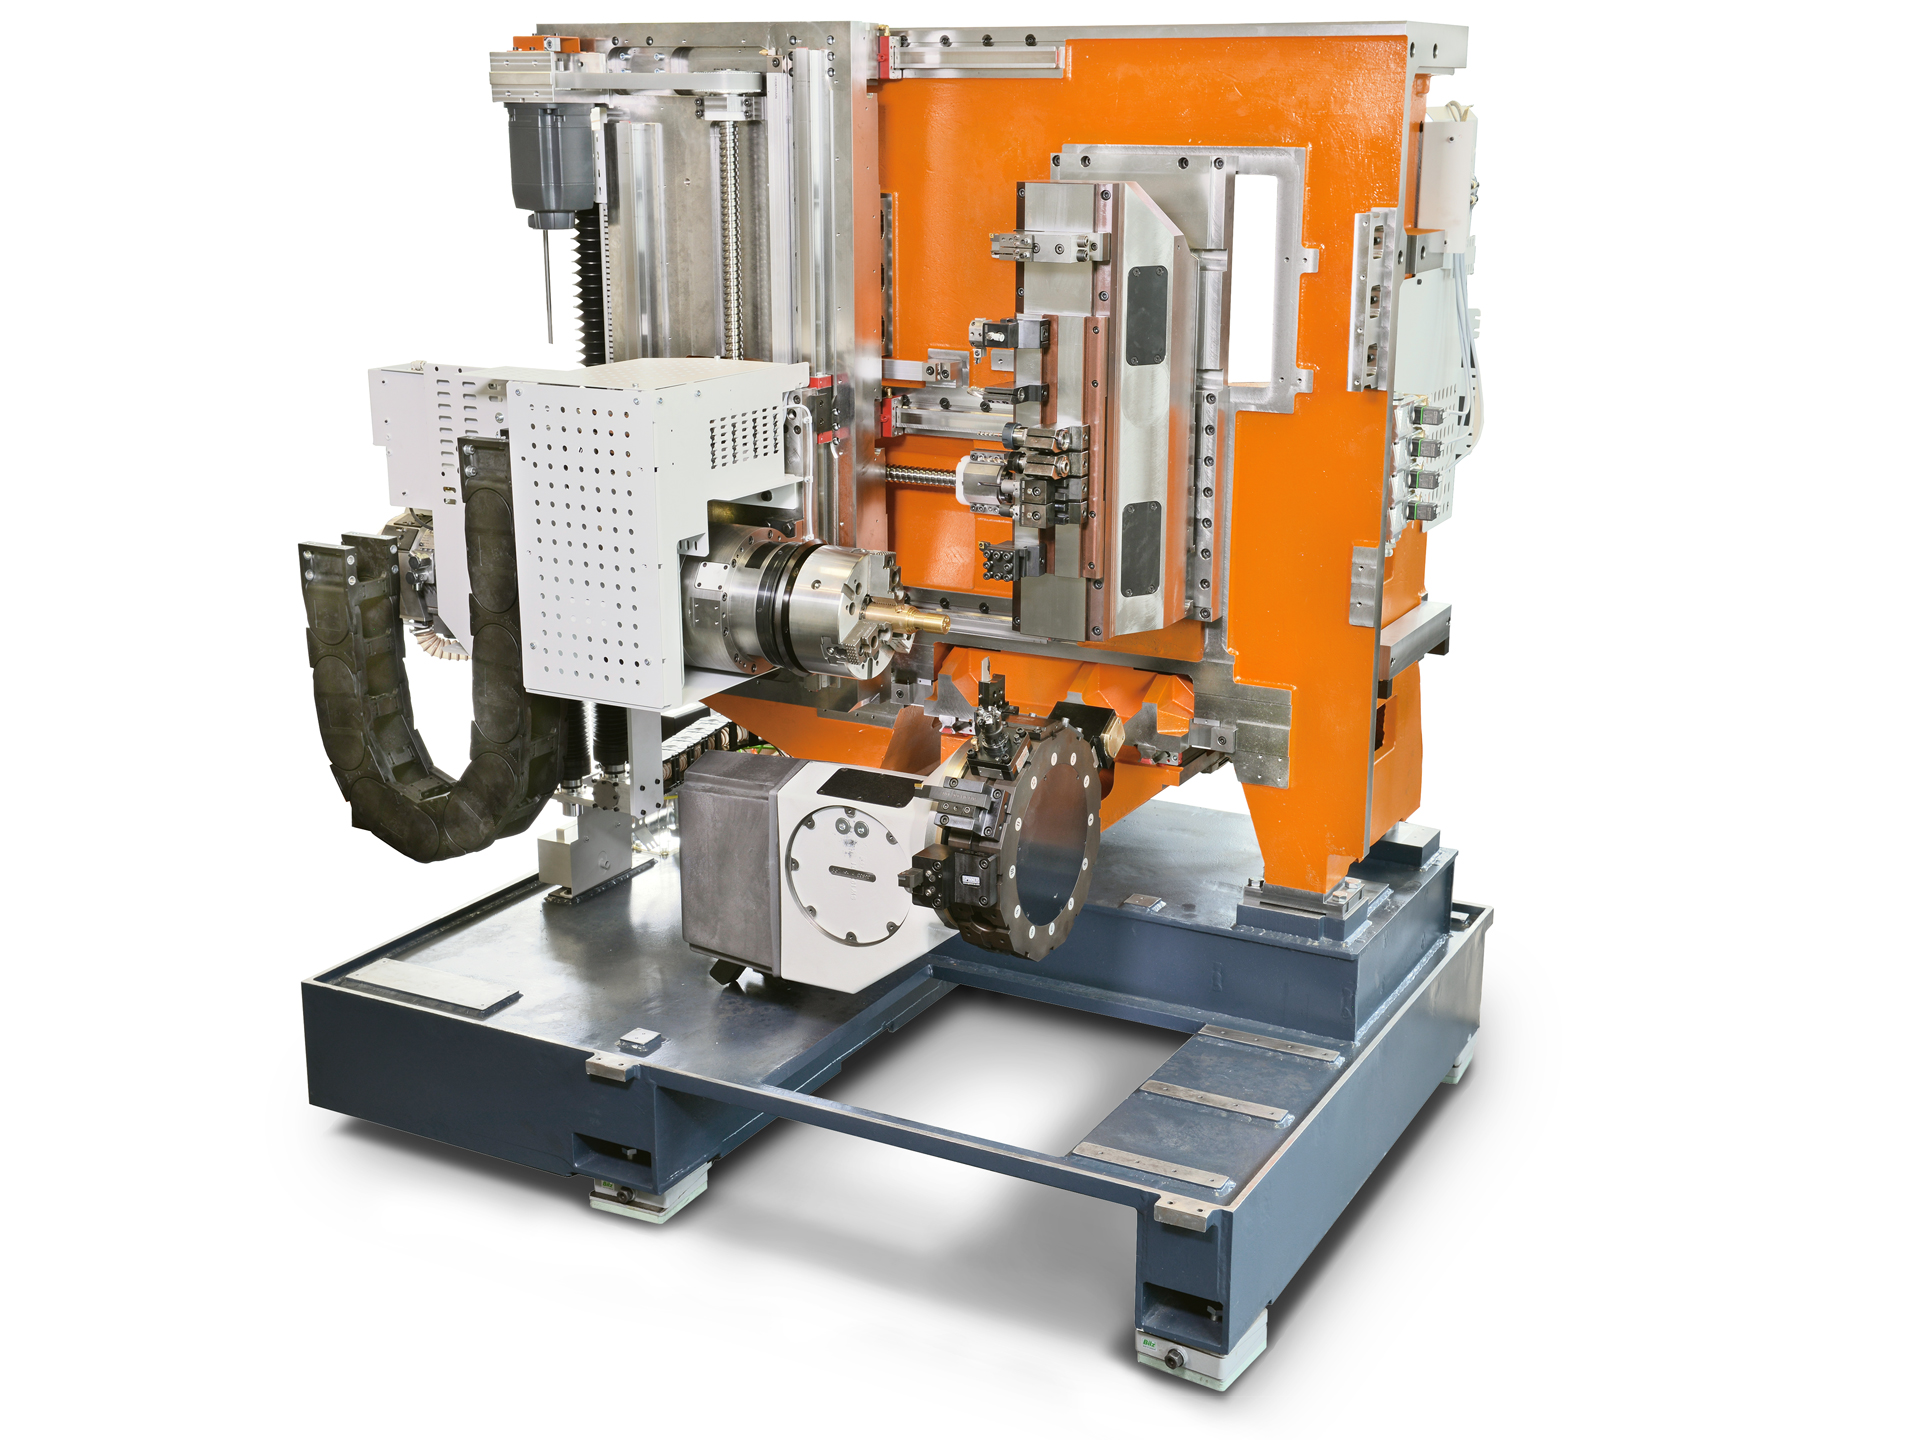 Spinner AG - Ultrapräzisionszentrum Microturn LT - vertikales Maschinenbett